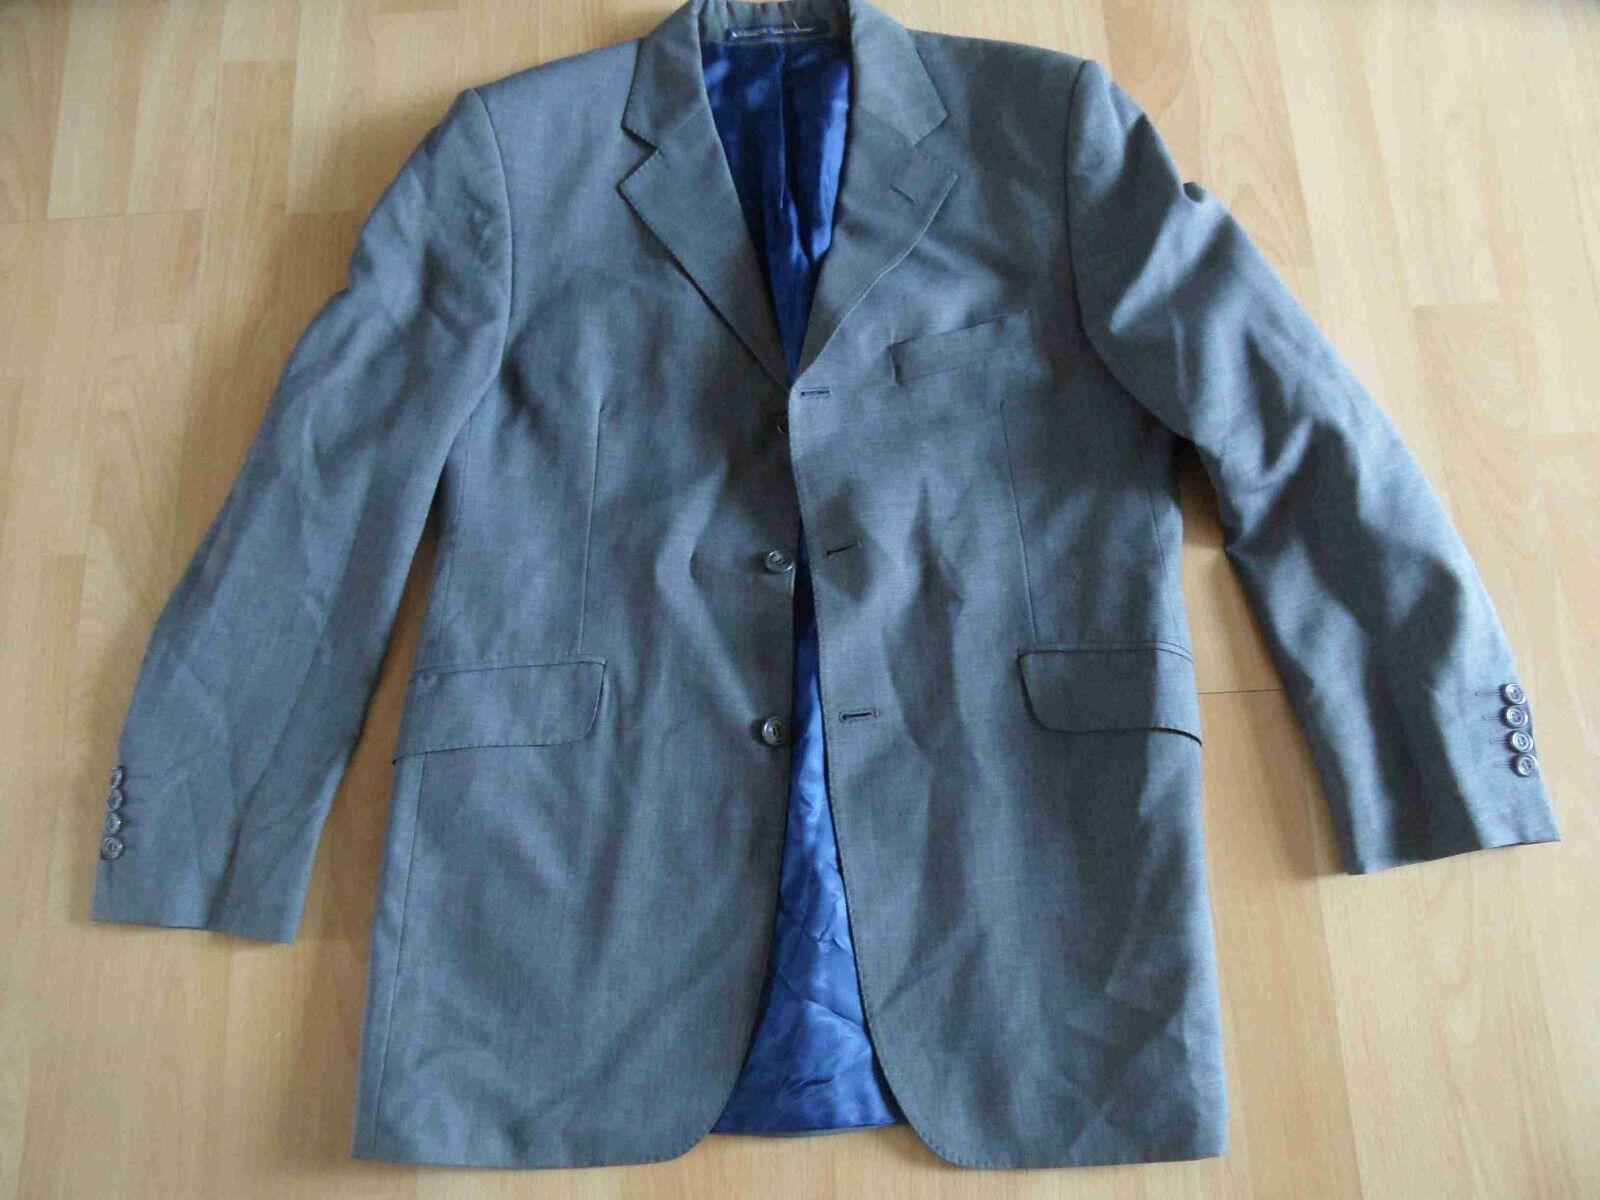 MARKS & SPENCER schöner Anzug grau Wolle Mohair Gr. 102 / 34/31 TOP  (KSA 314)